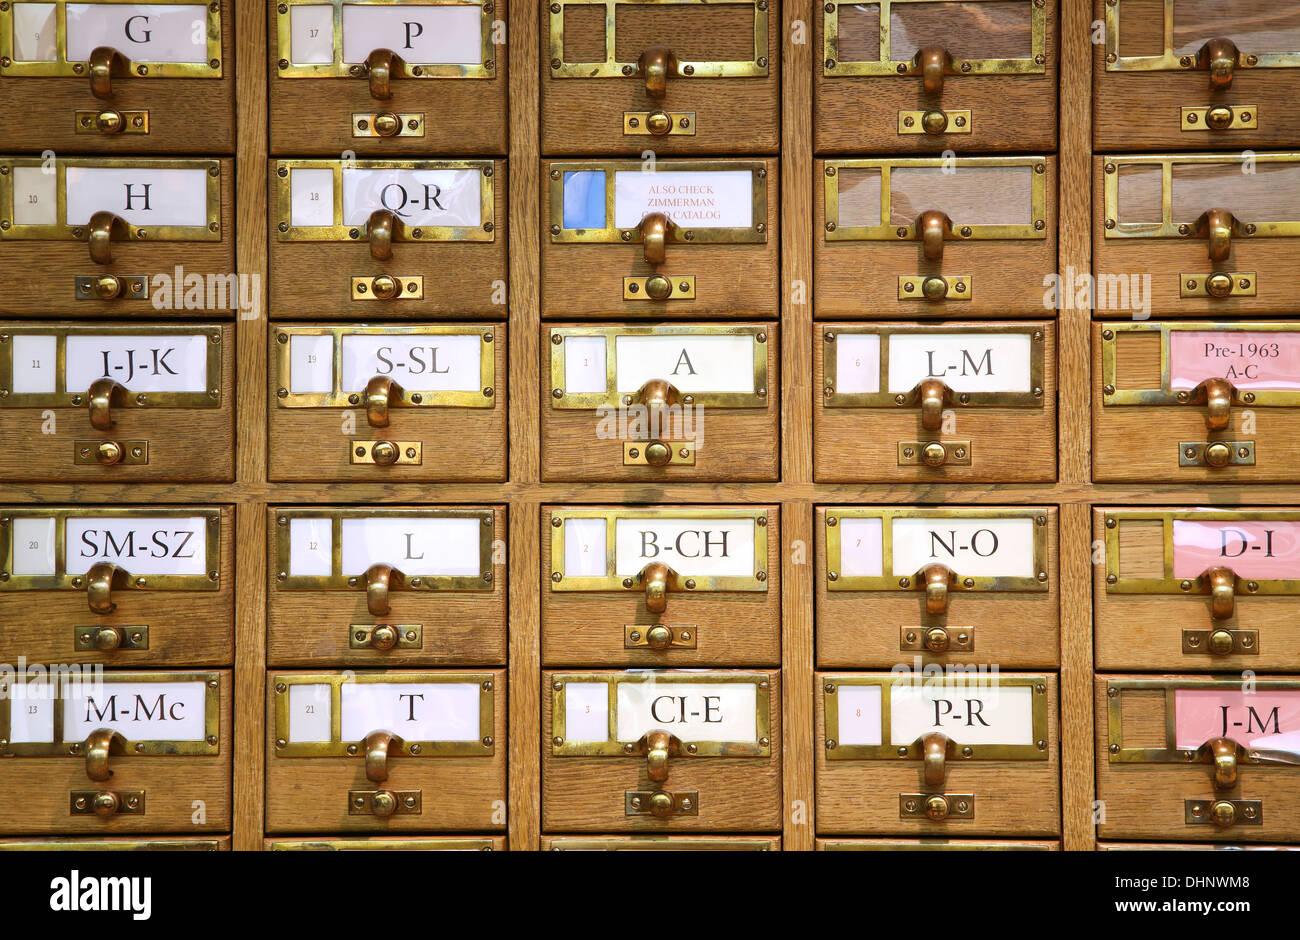 Card catalog, Zimmerman Library, University of New Mexico Campus, Albuquerque, New Mexico USA - Stock Image